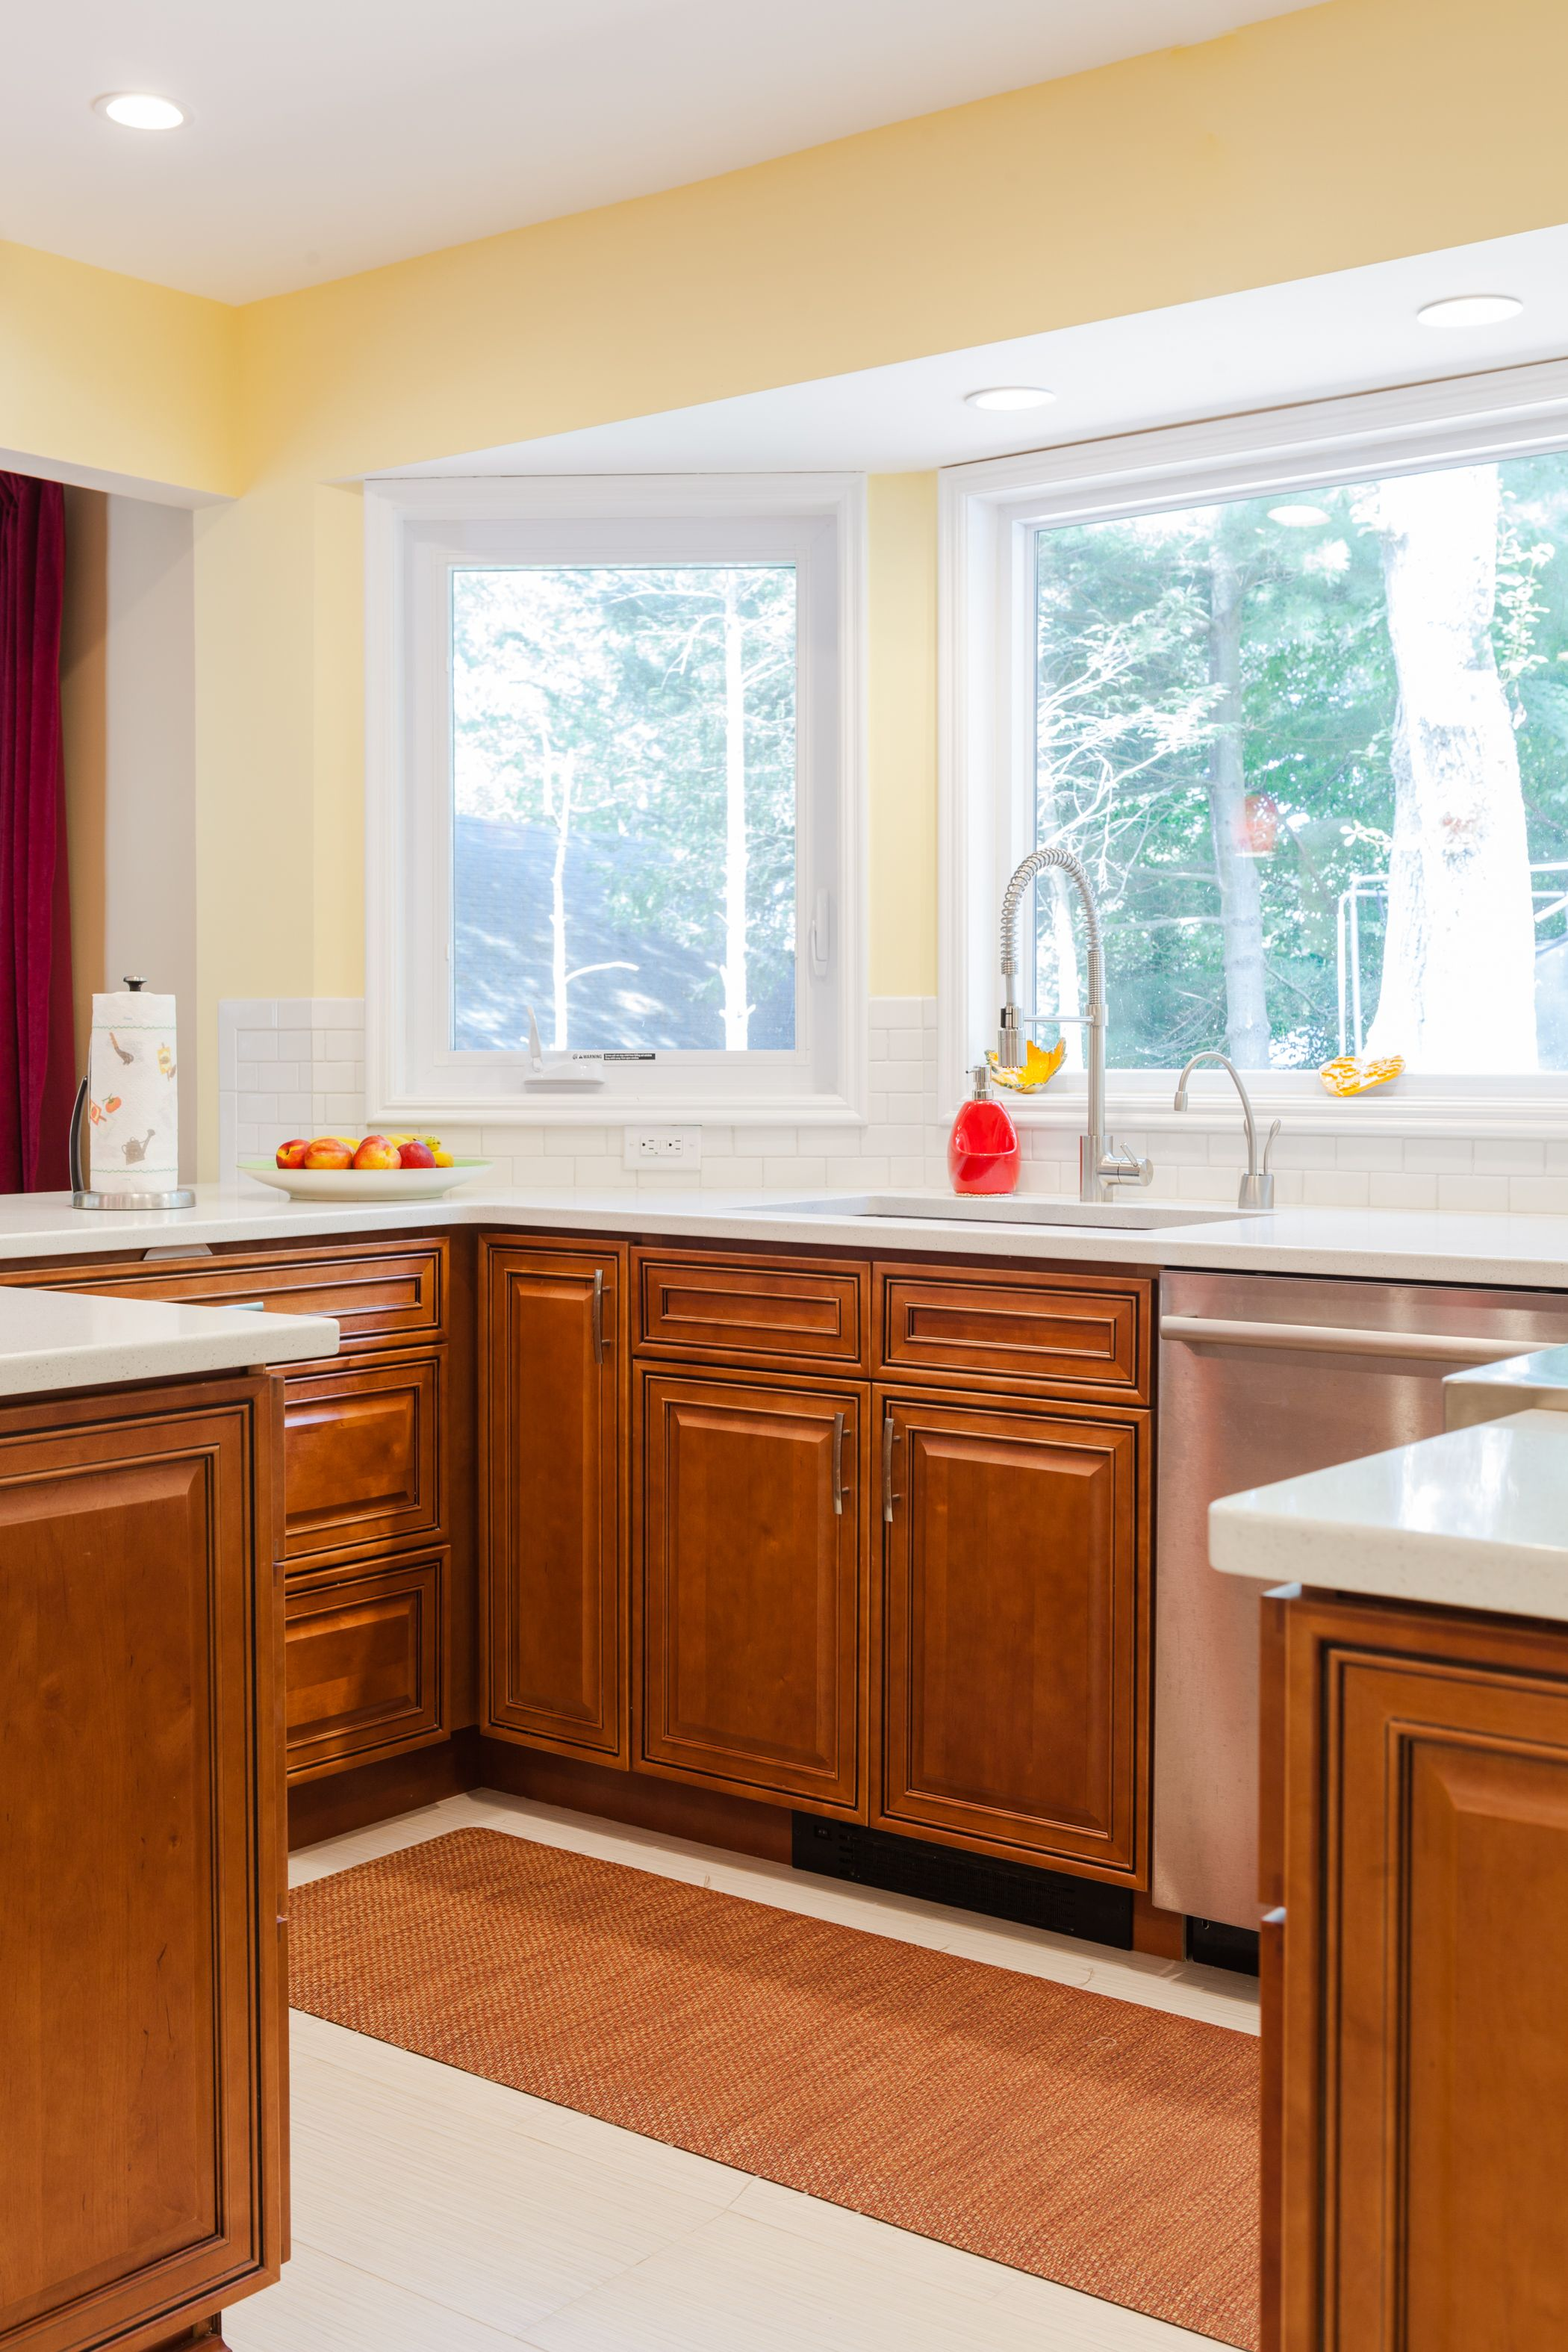 J&k Mocha Glazed Traditional Maple Wood Cabinetsstyle K10 Custom Bathroom Kitchen Remodeling Review